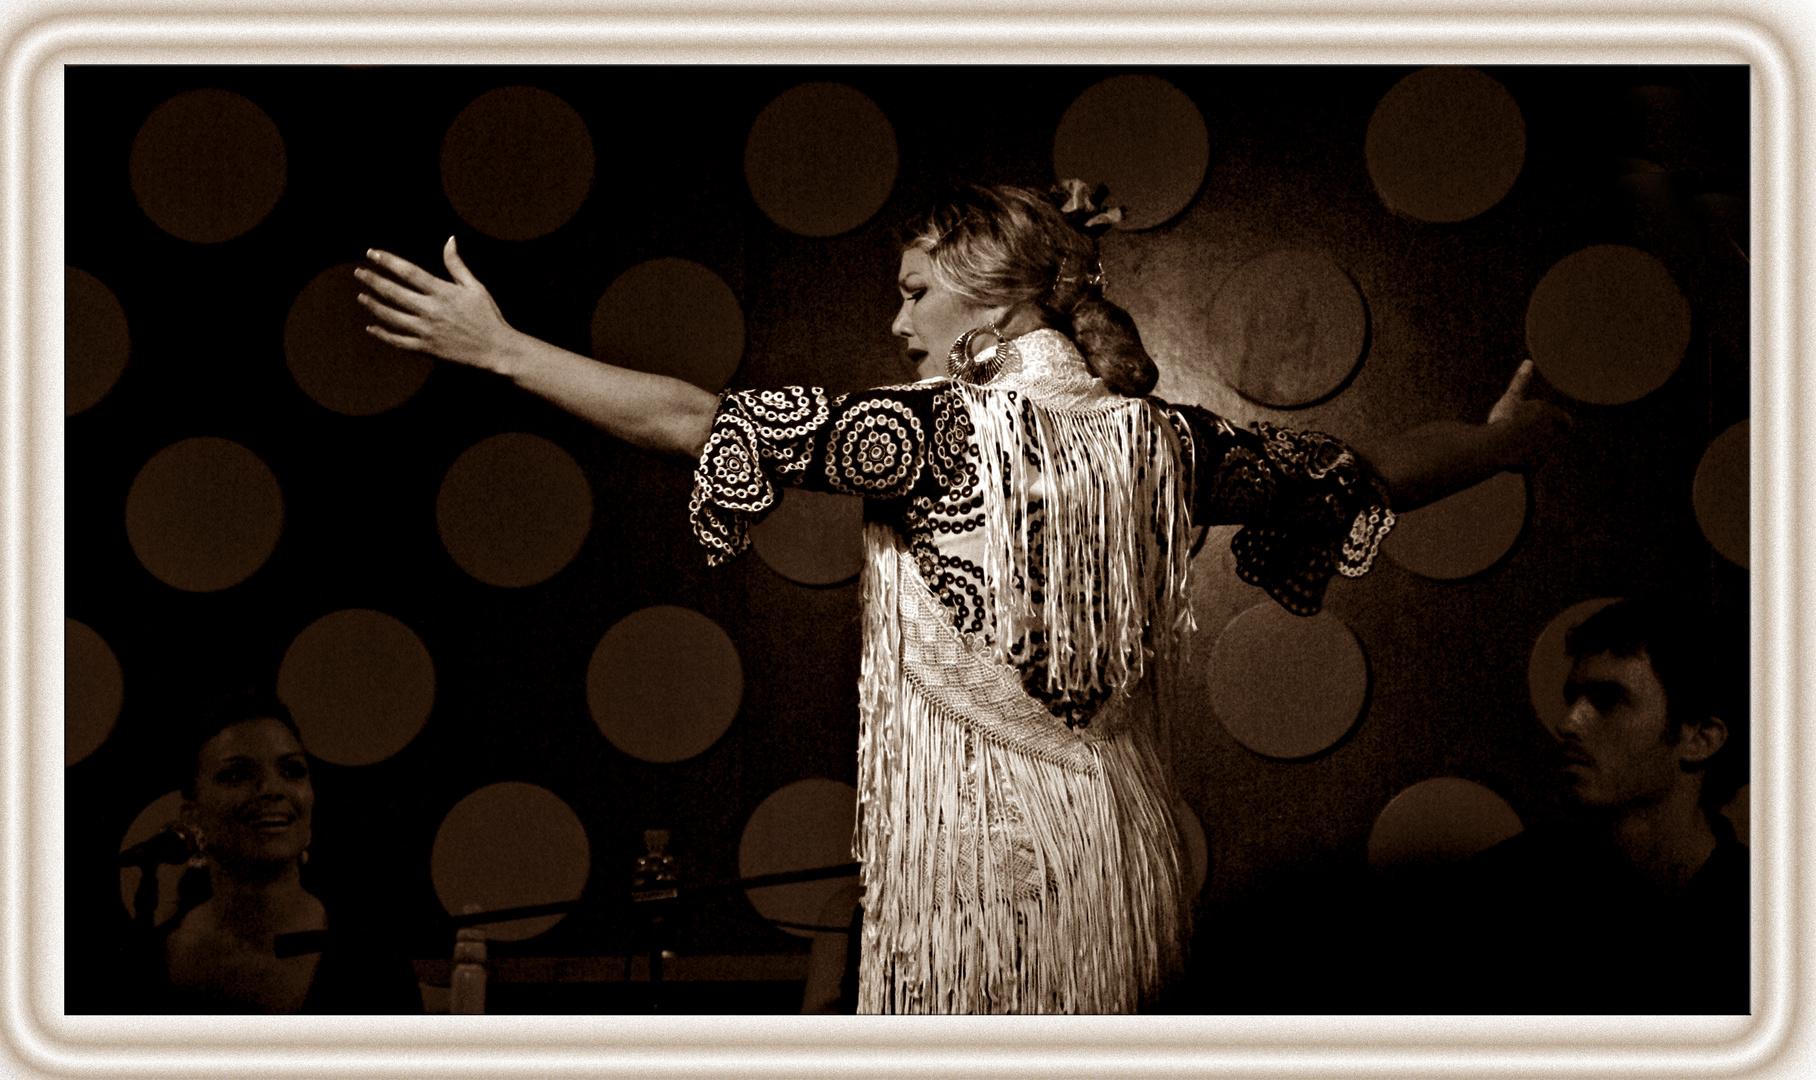 Tarantos - Recordando a Carmen Amaya